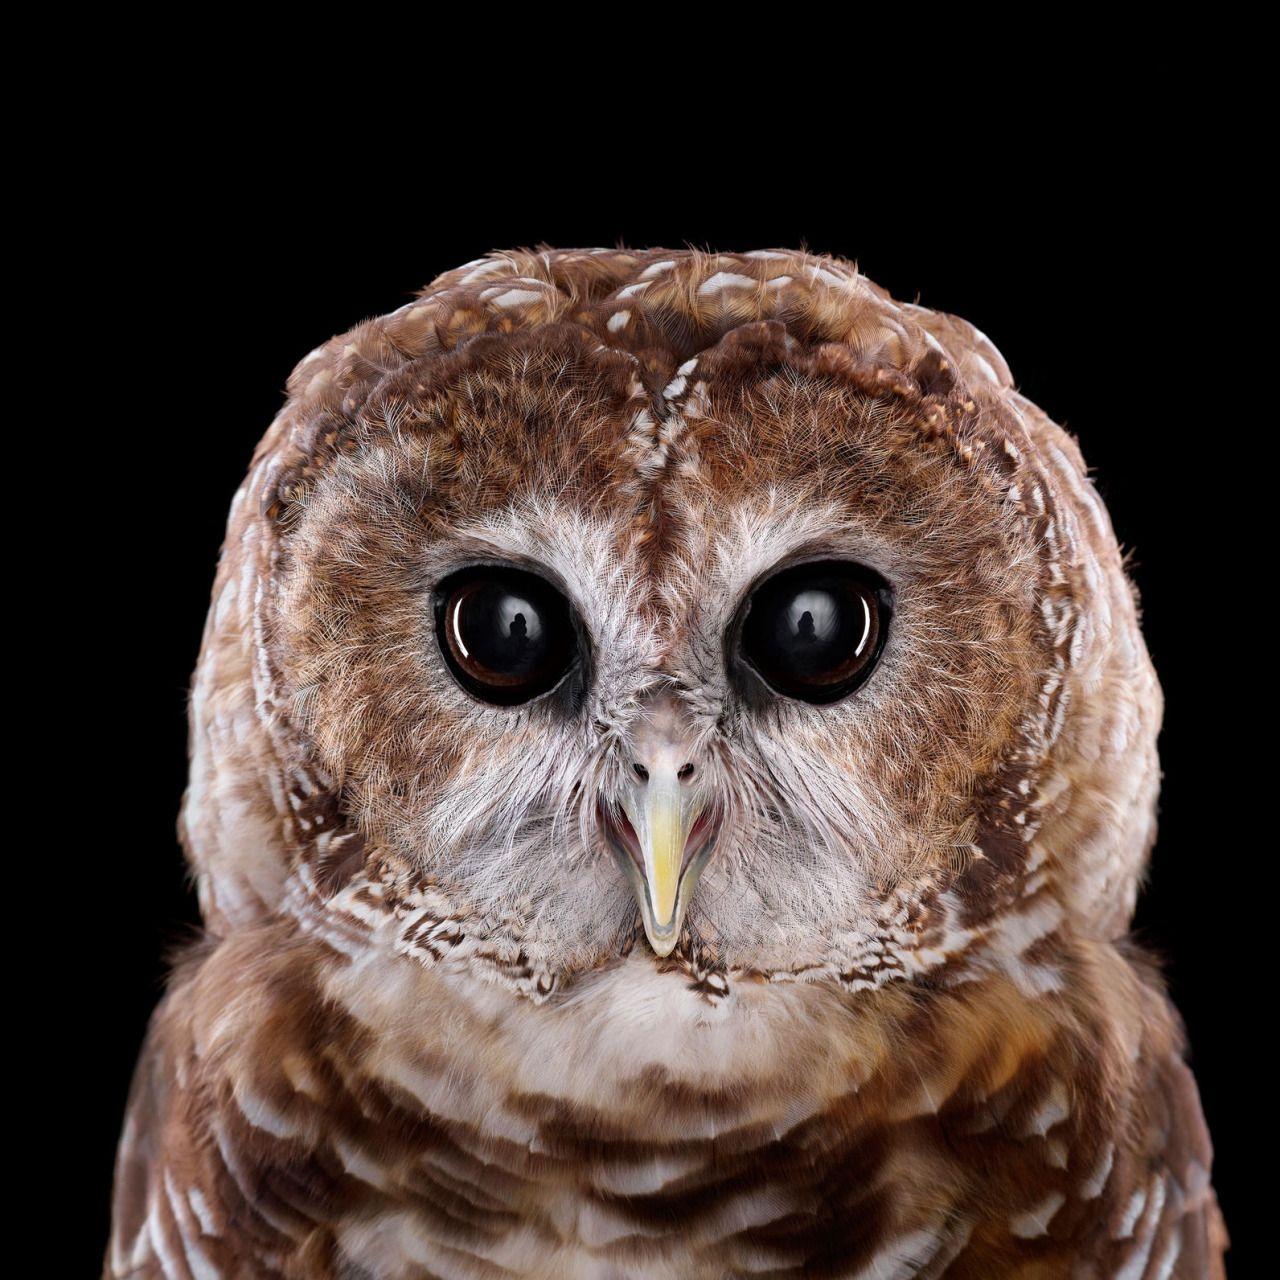 Incredible Studio Portraits Of Wild Animals By Brad Wilson: Fleckenkauz, Eule